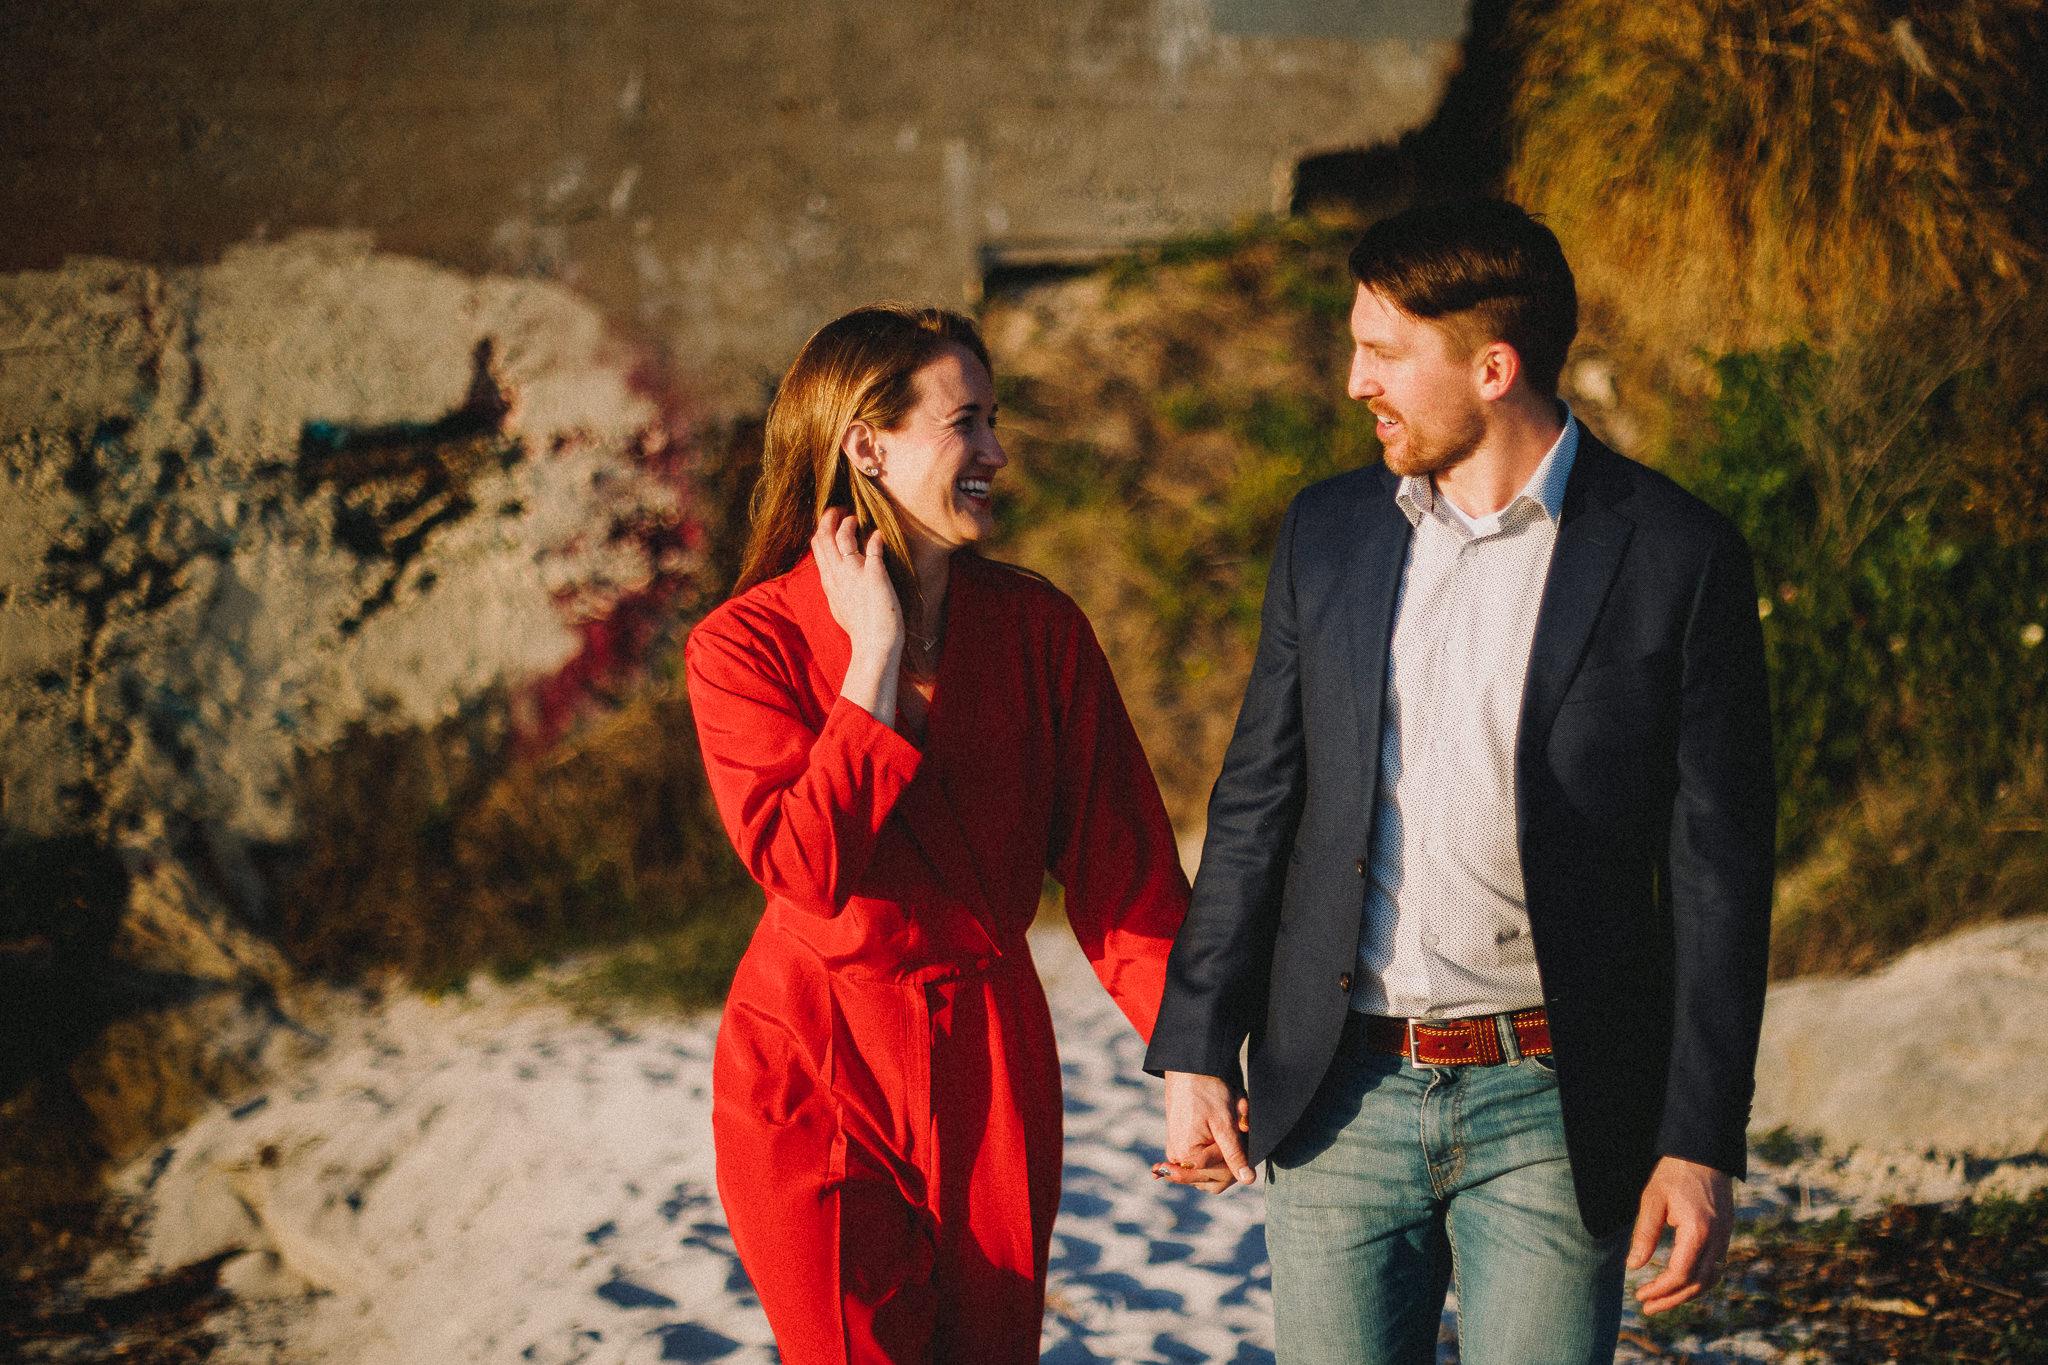 Archer Inspired Photography Carmel Beach California Wedding Engagement Lifestyle Anniversary Natural Light Photographer-6.jpg